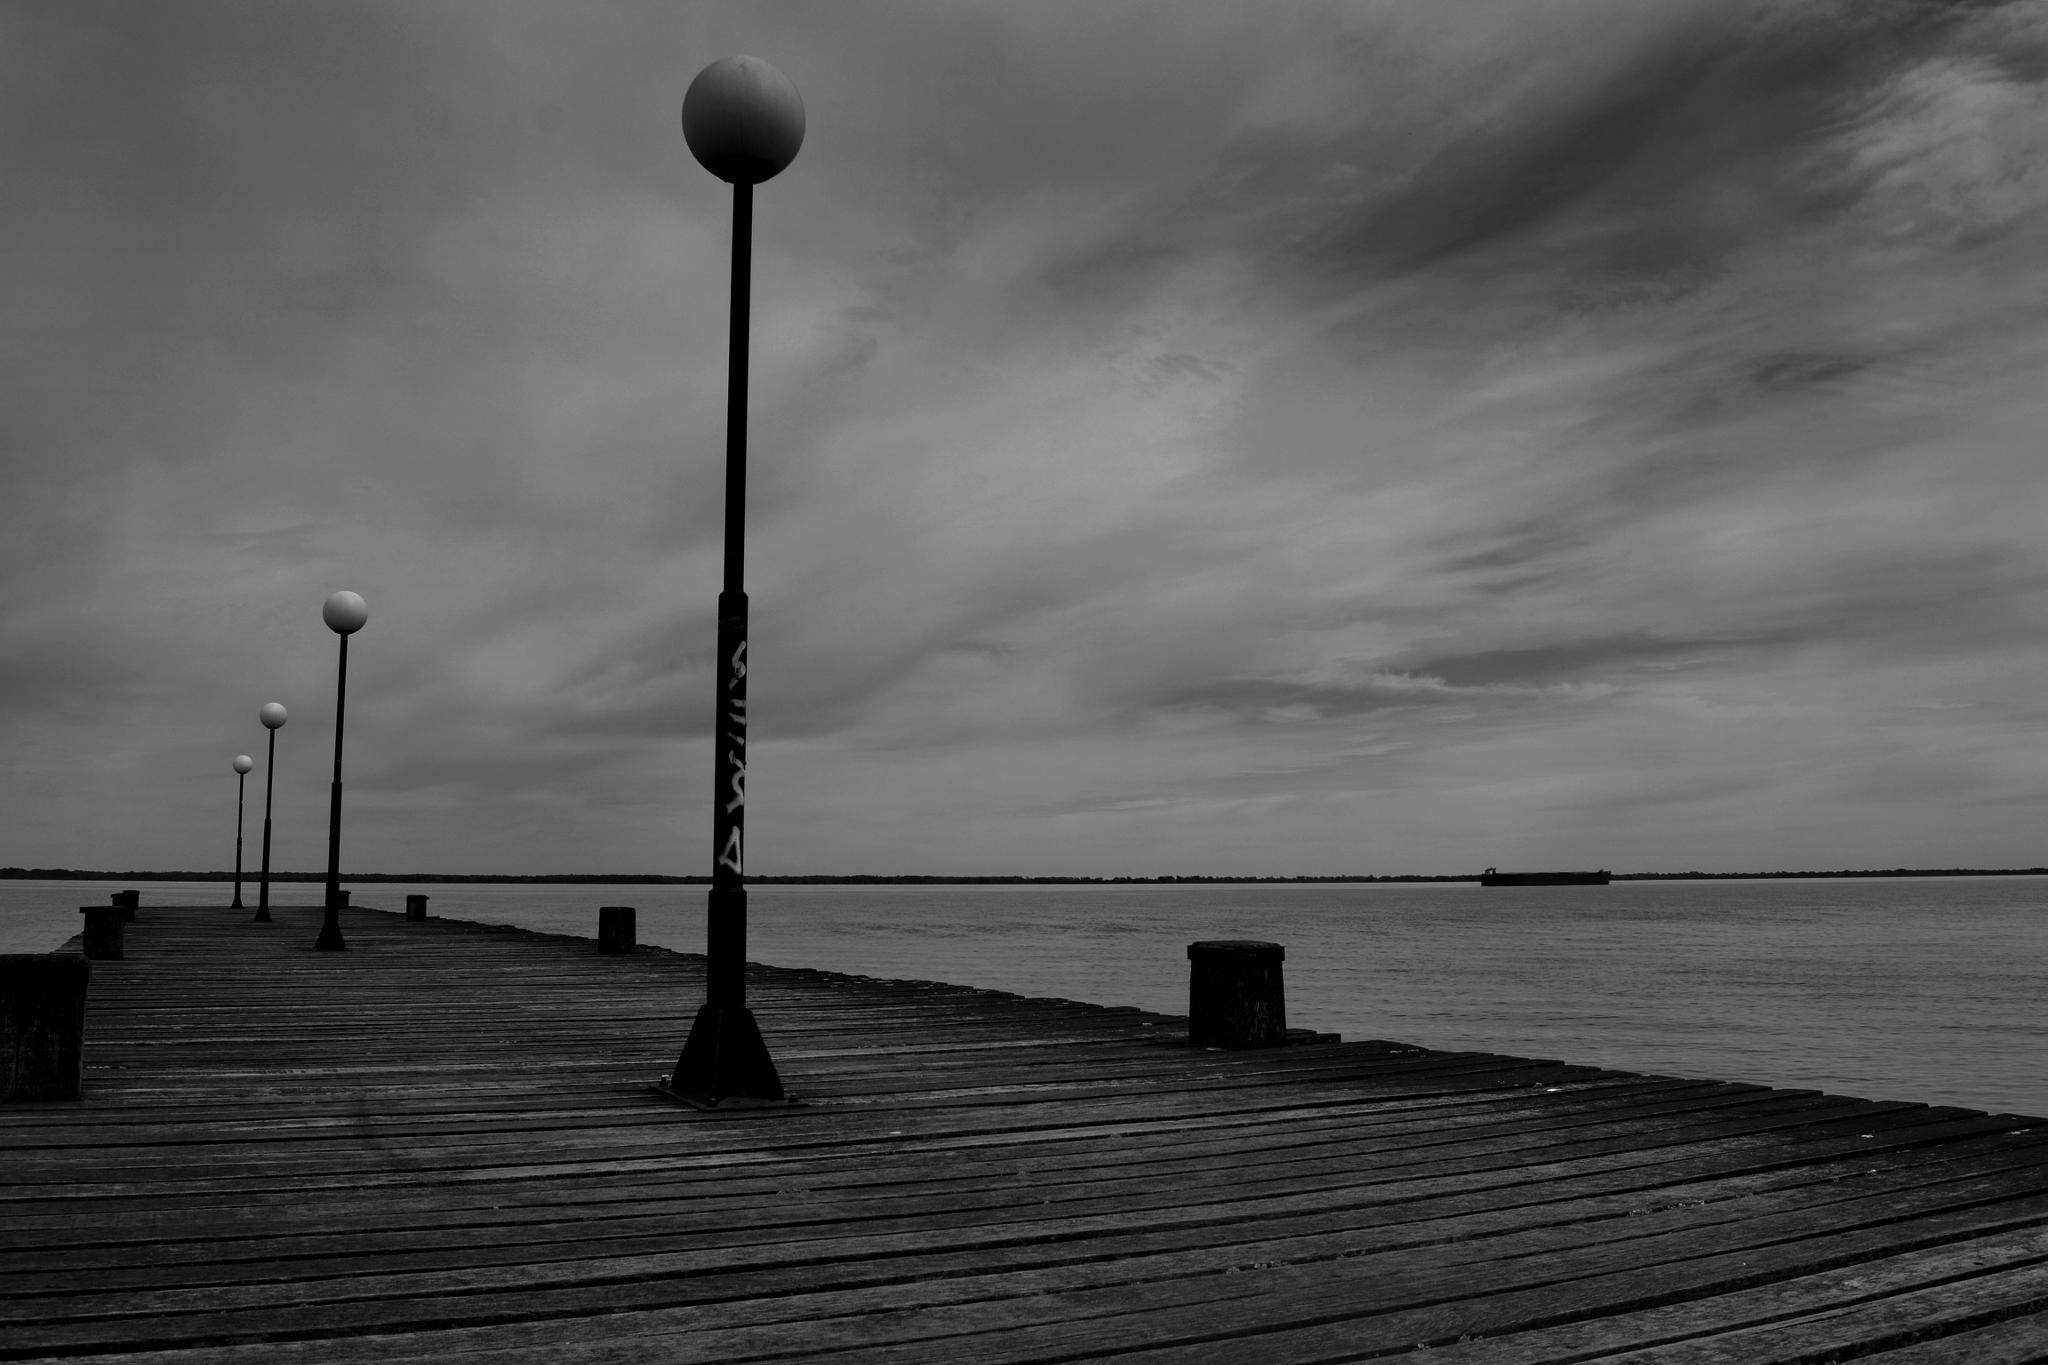 infinite sadness by Jose Luis LLanes